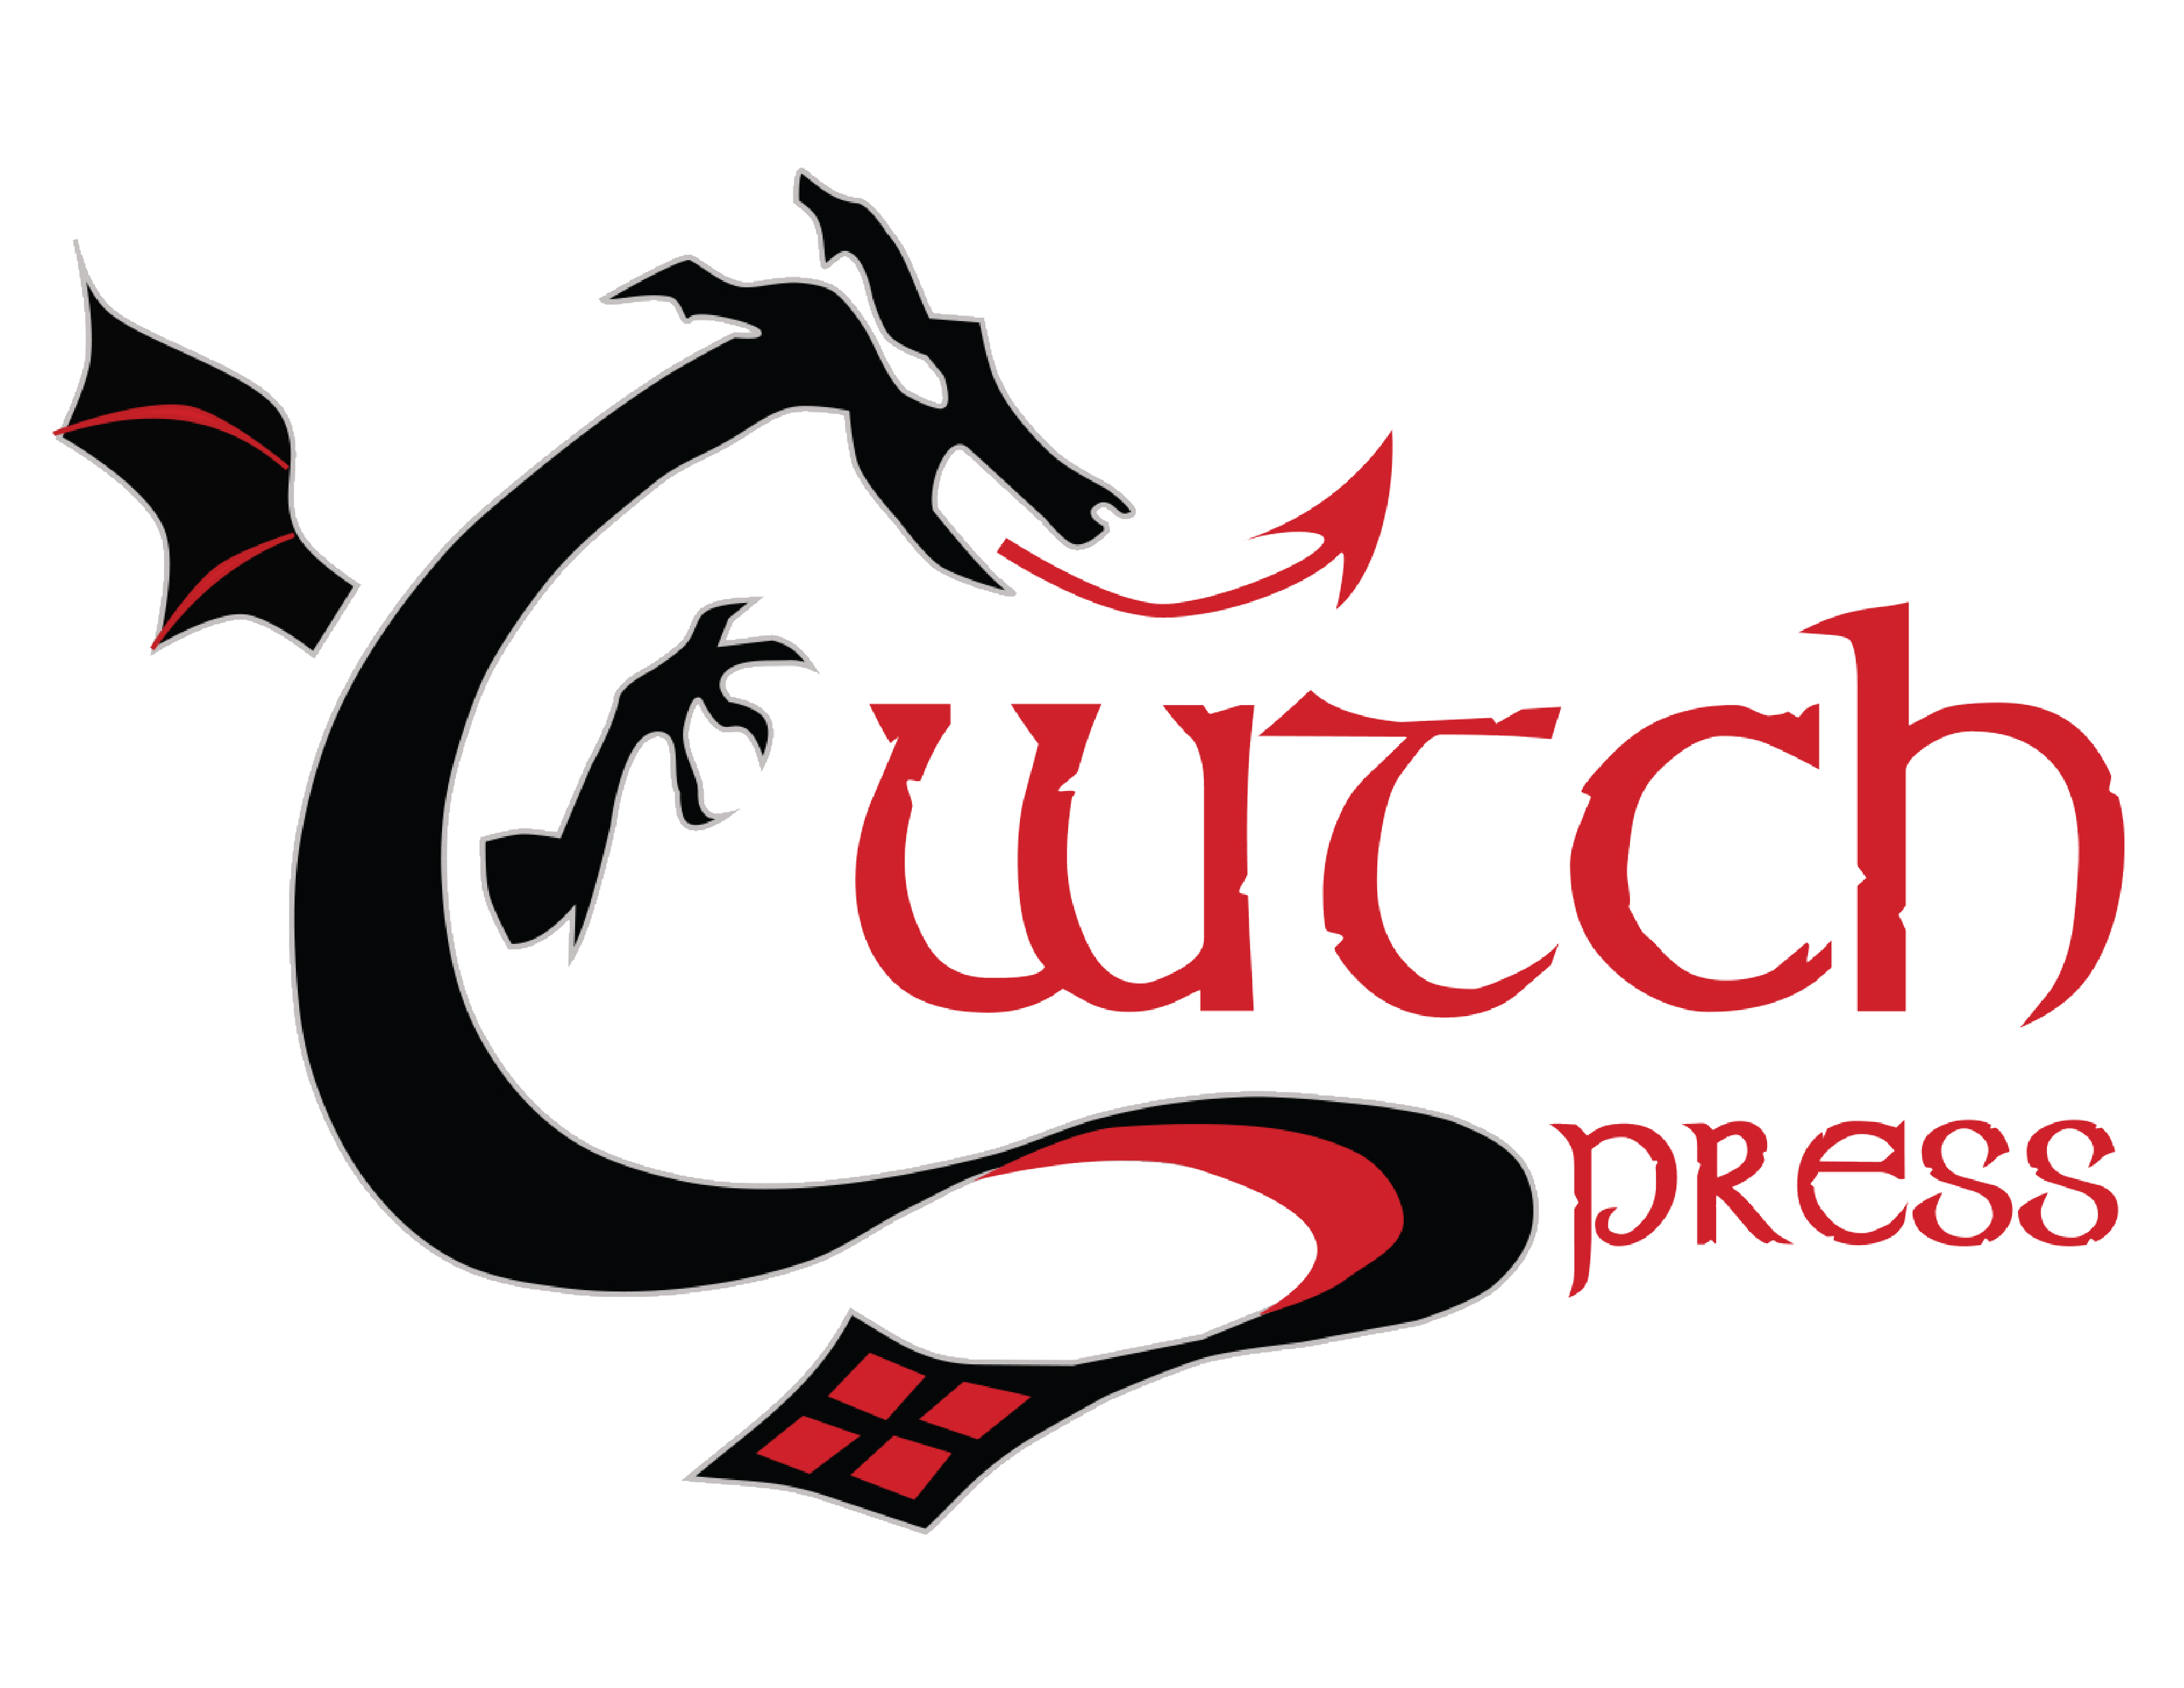 Cwtch Press